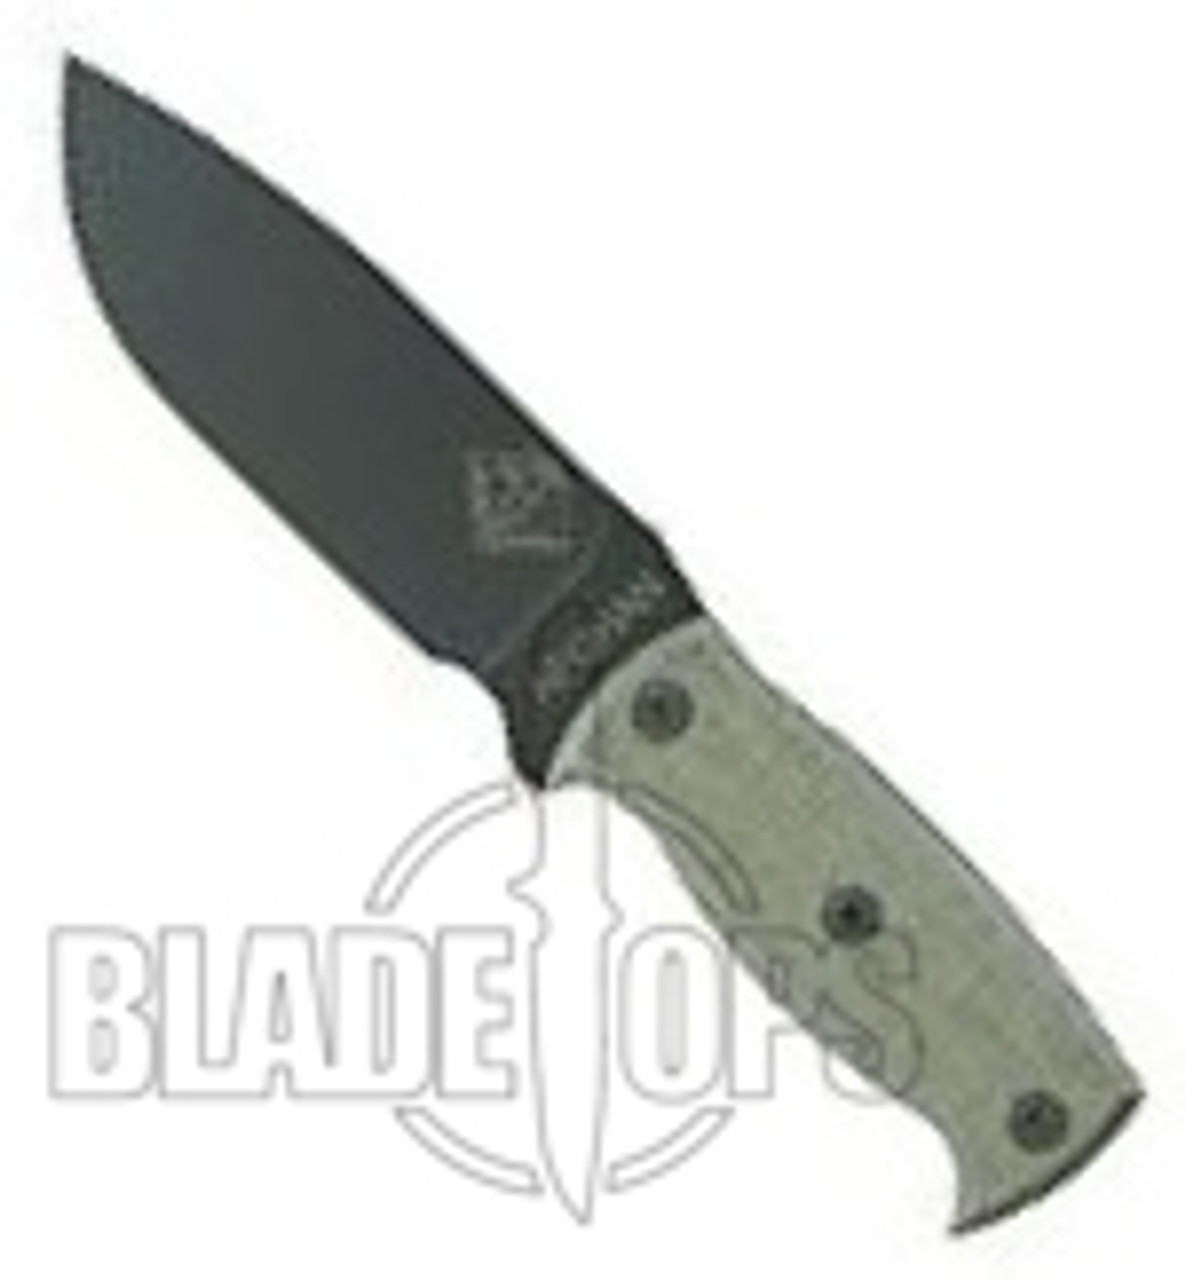 Ontario Ranger Series Afghan Black Micarta Plain Edge Knife, 9419BM